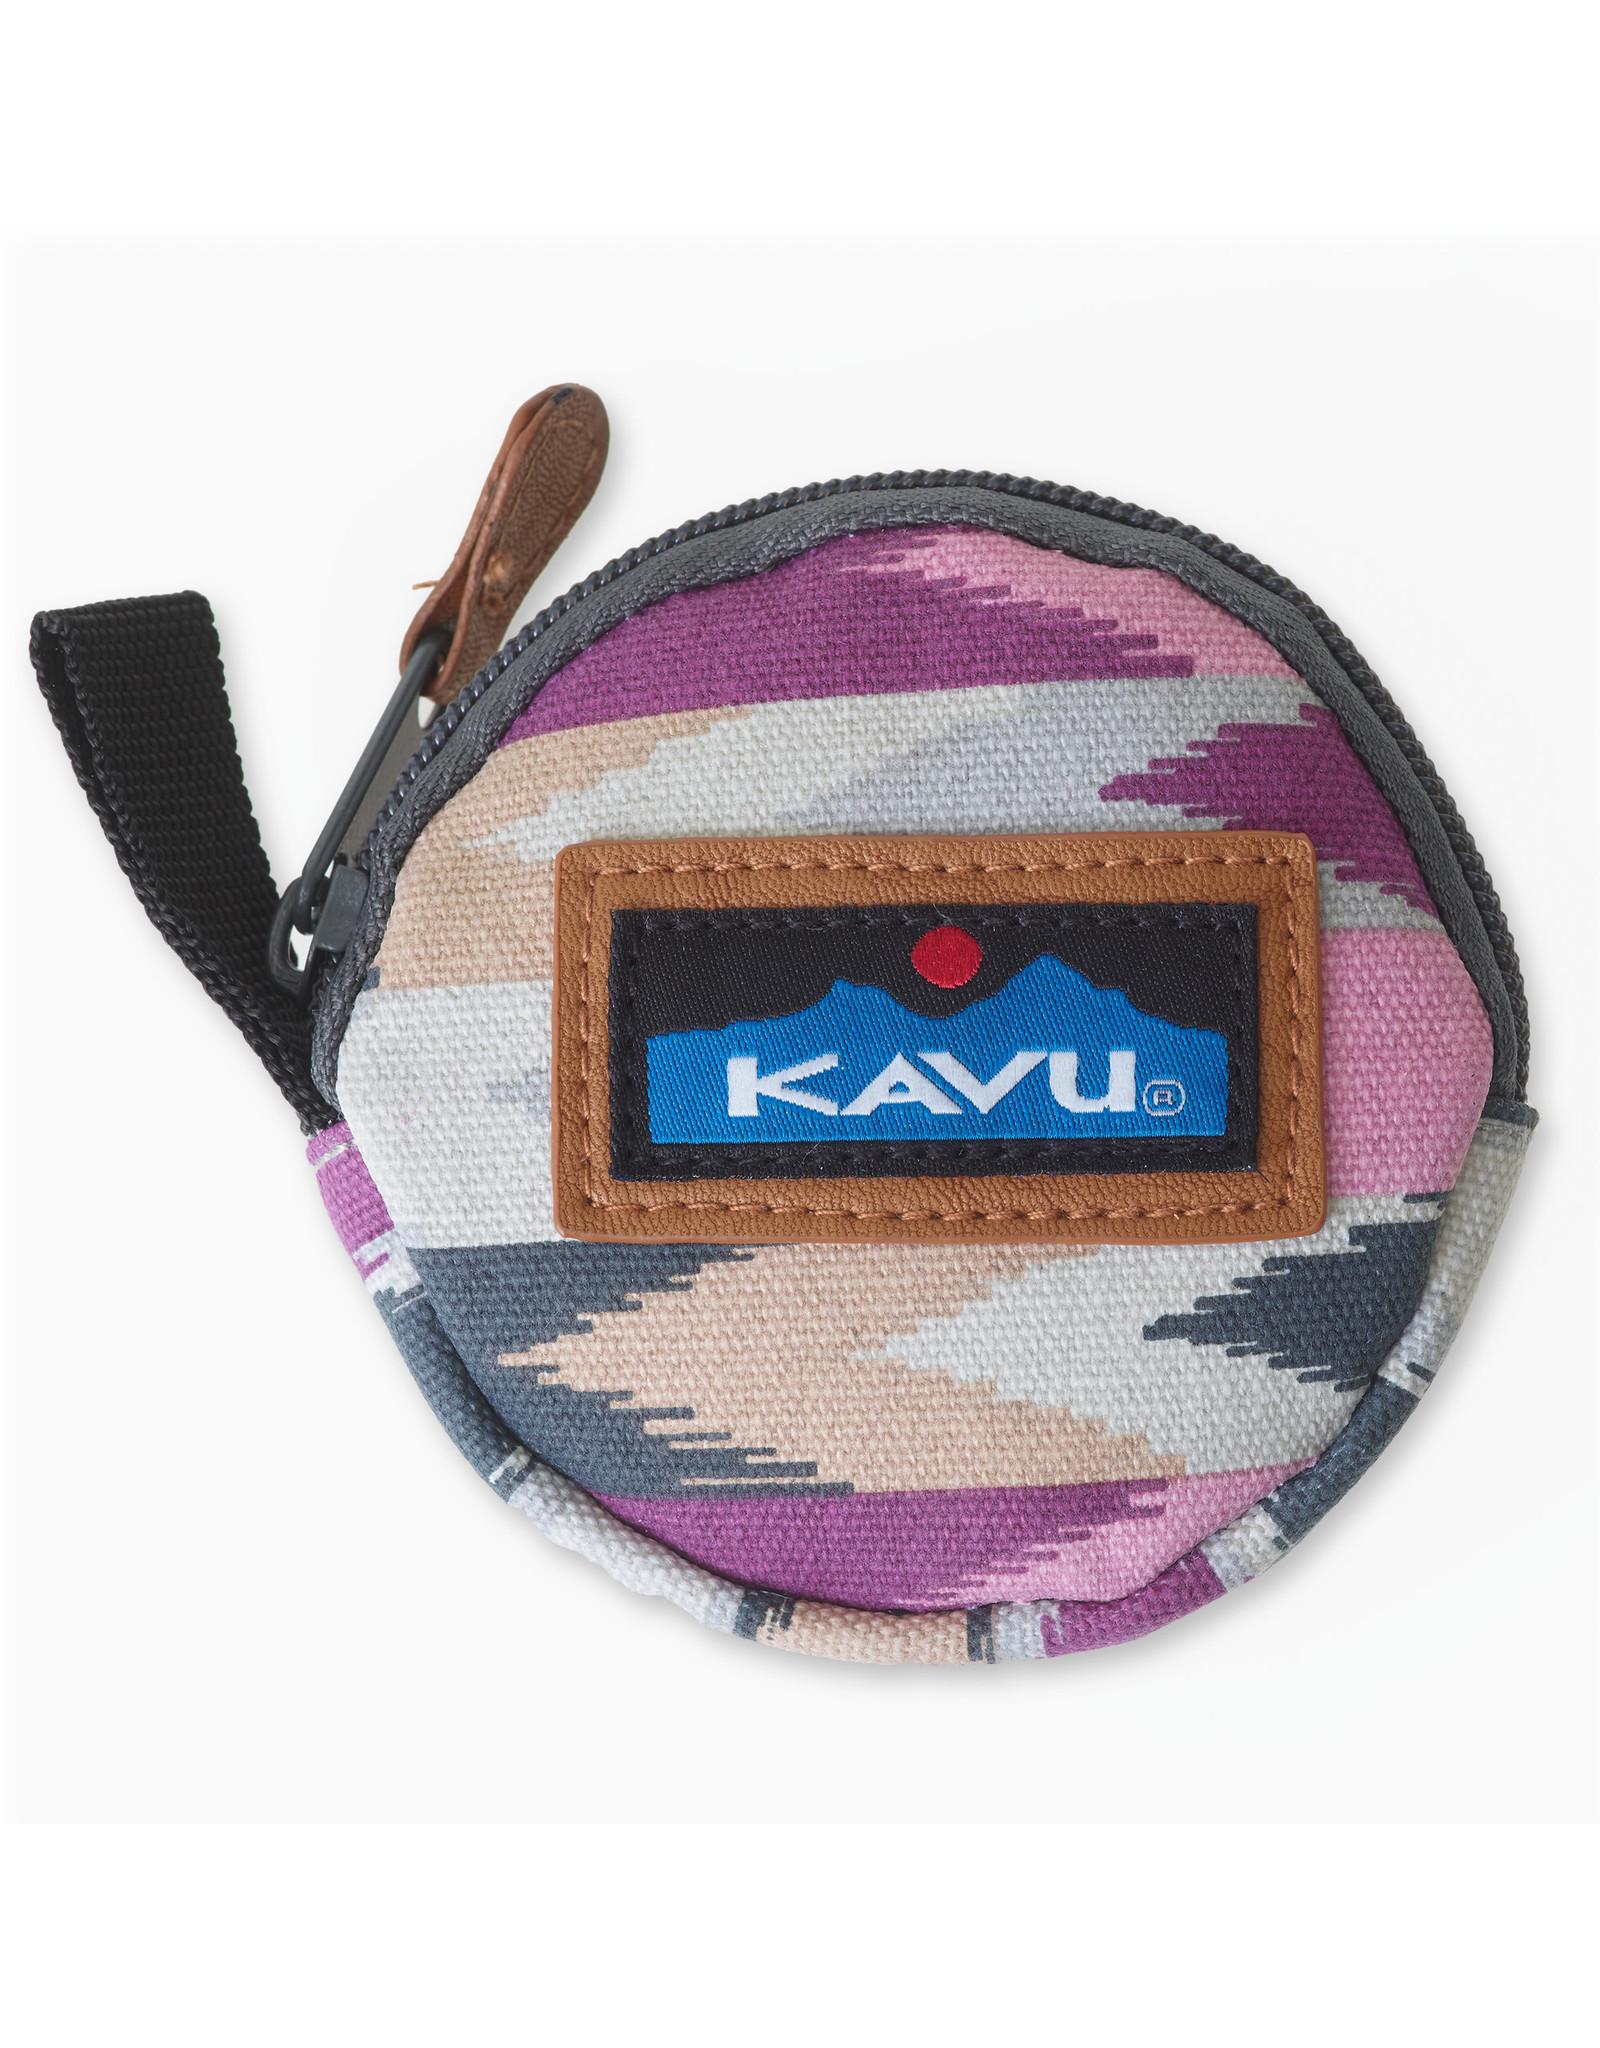 Kavu Coinkydink - Berry Palette